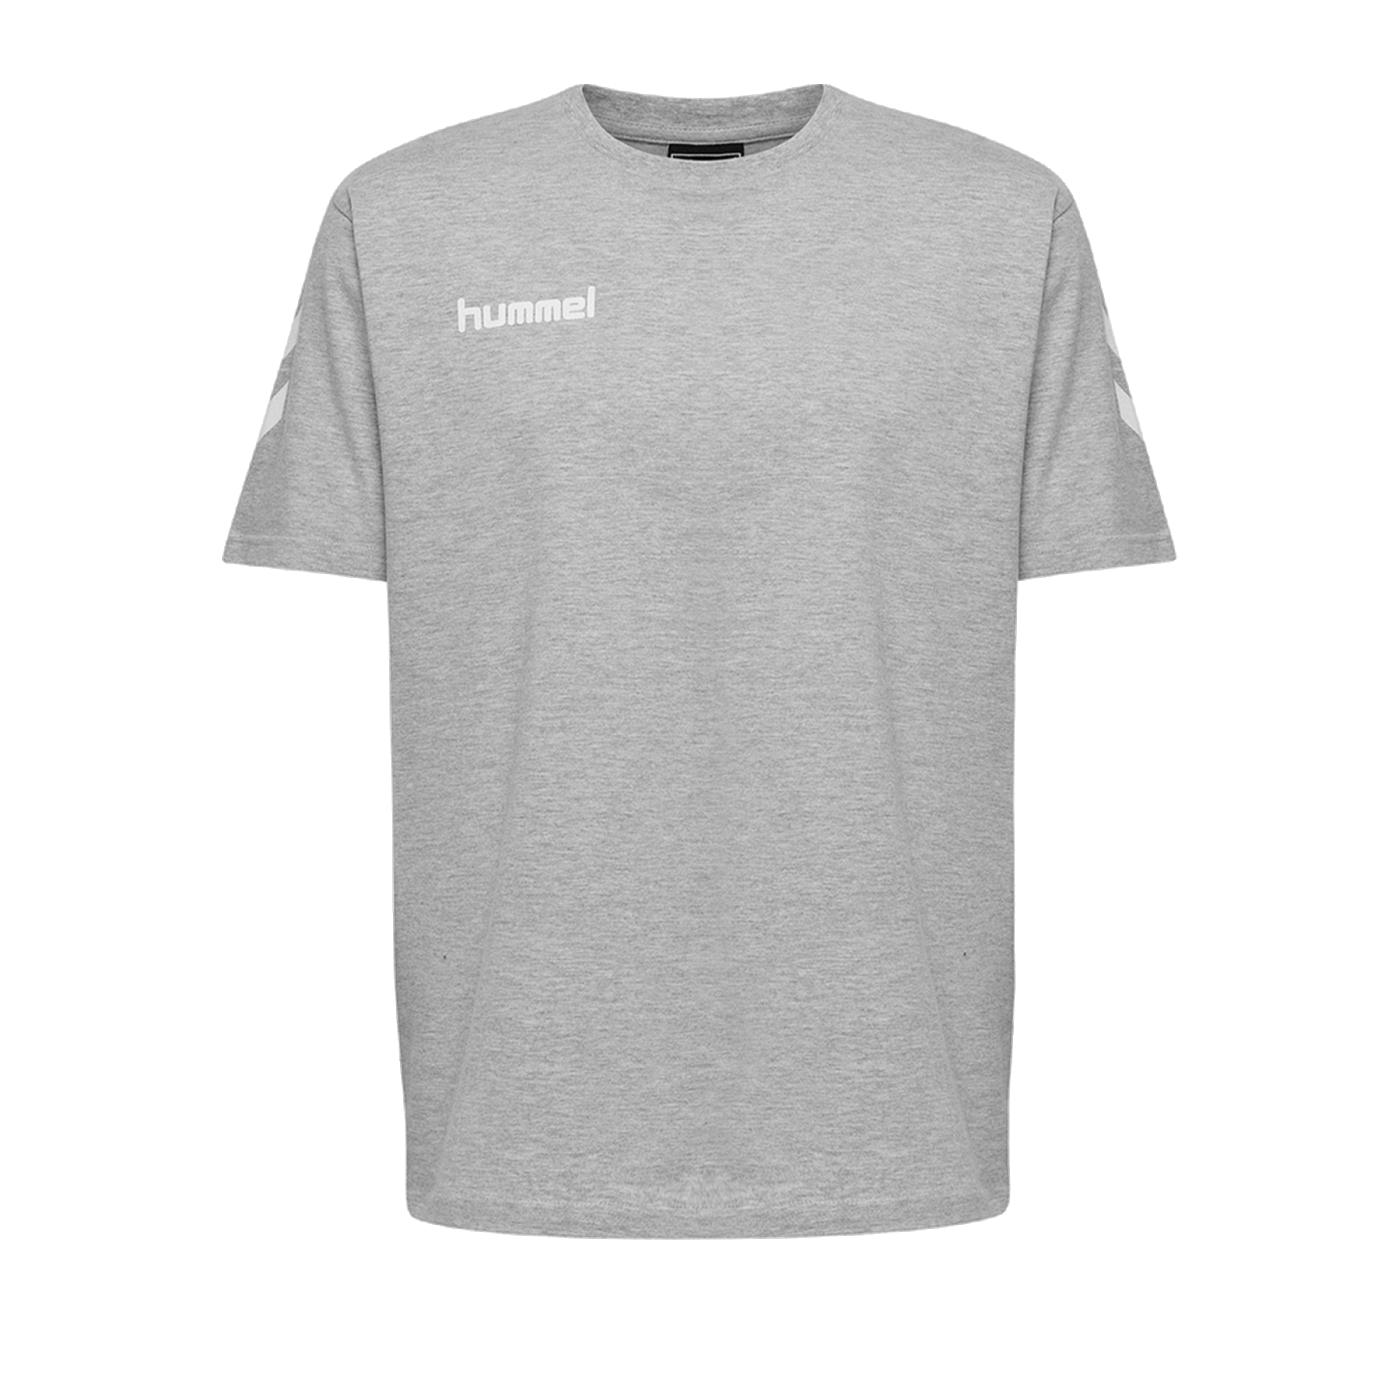 Hummel Cotton T-Shirt Kids Grau F2006 - Grau